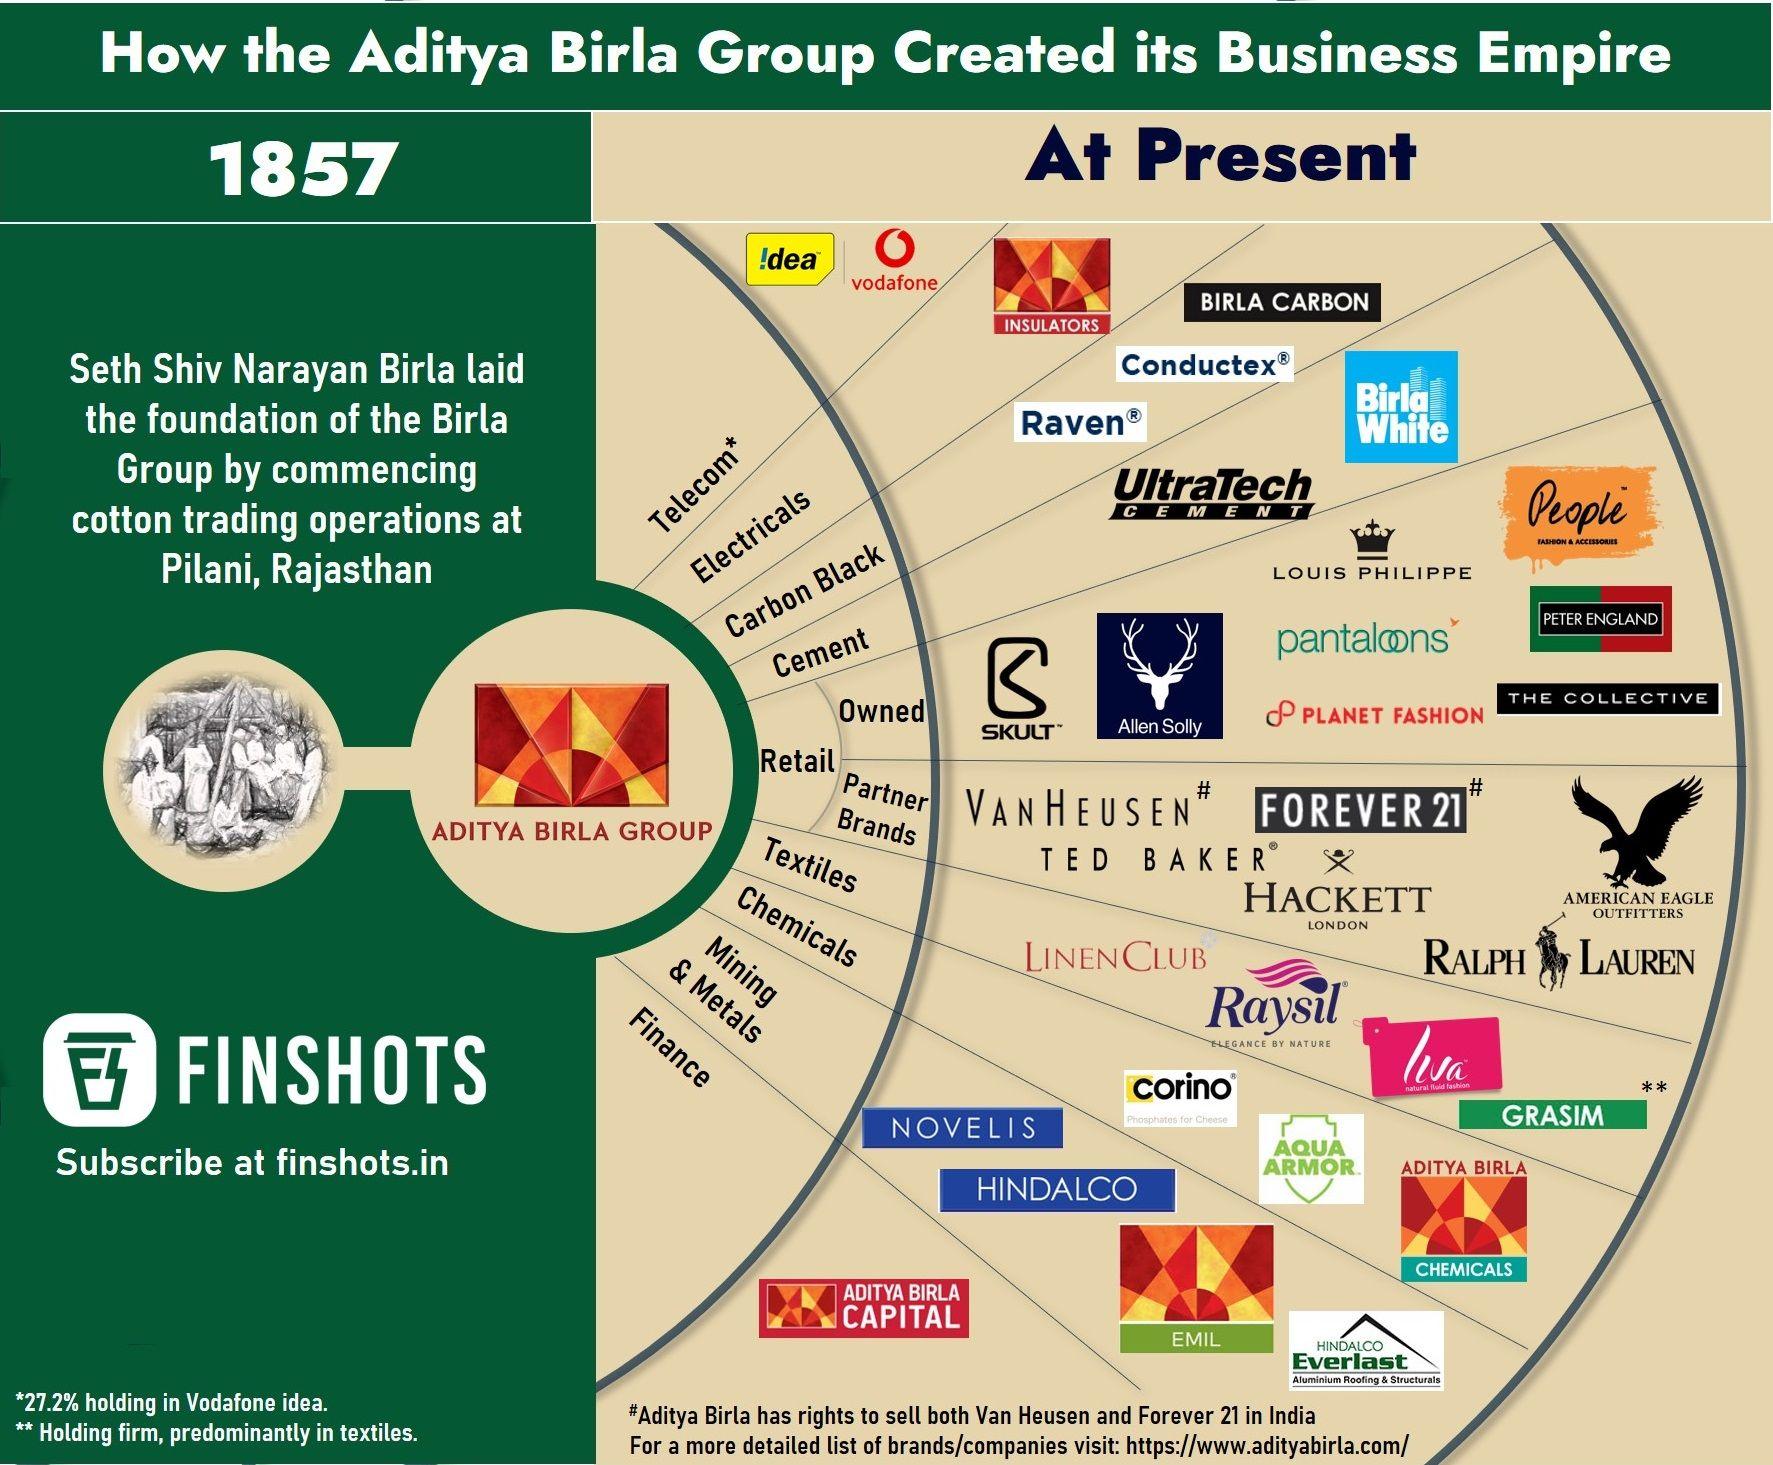 Aditya Birla Group's Business Empire